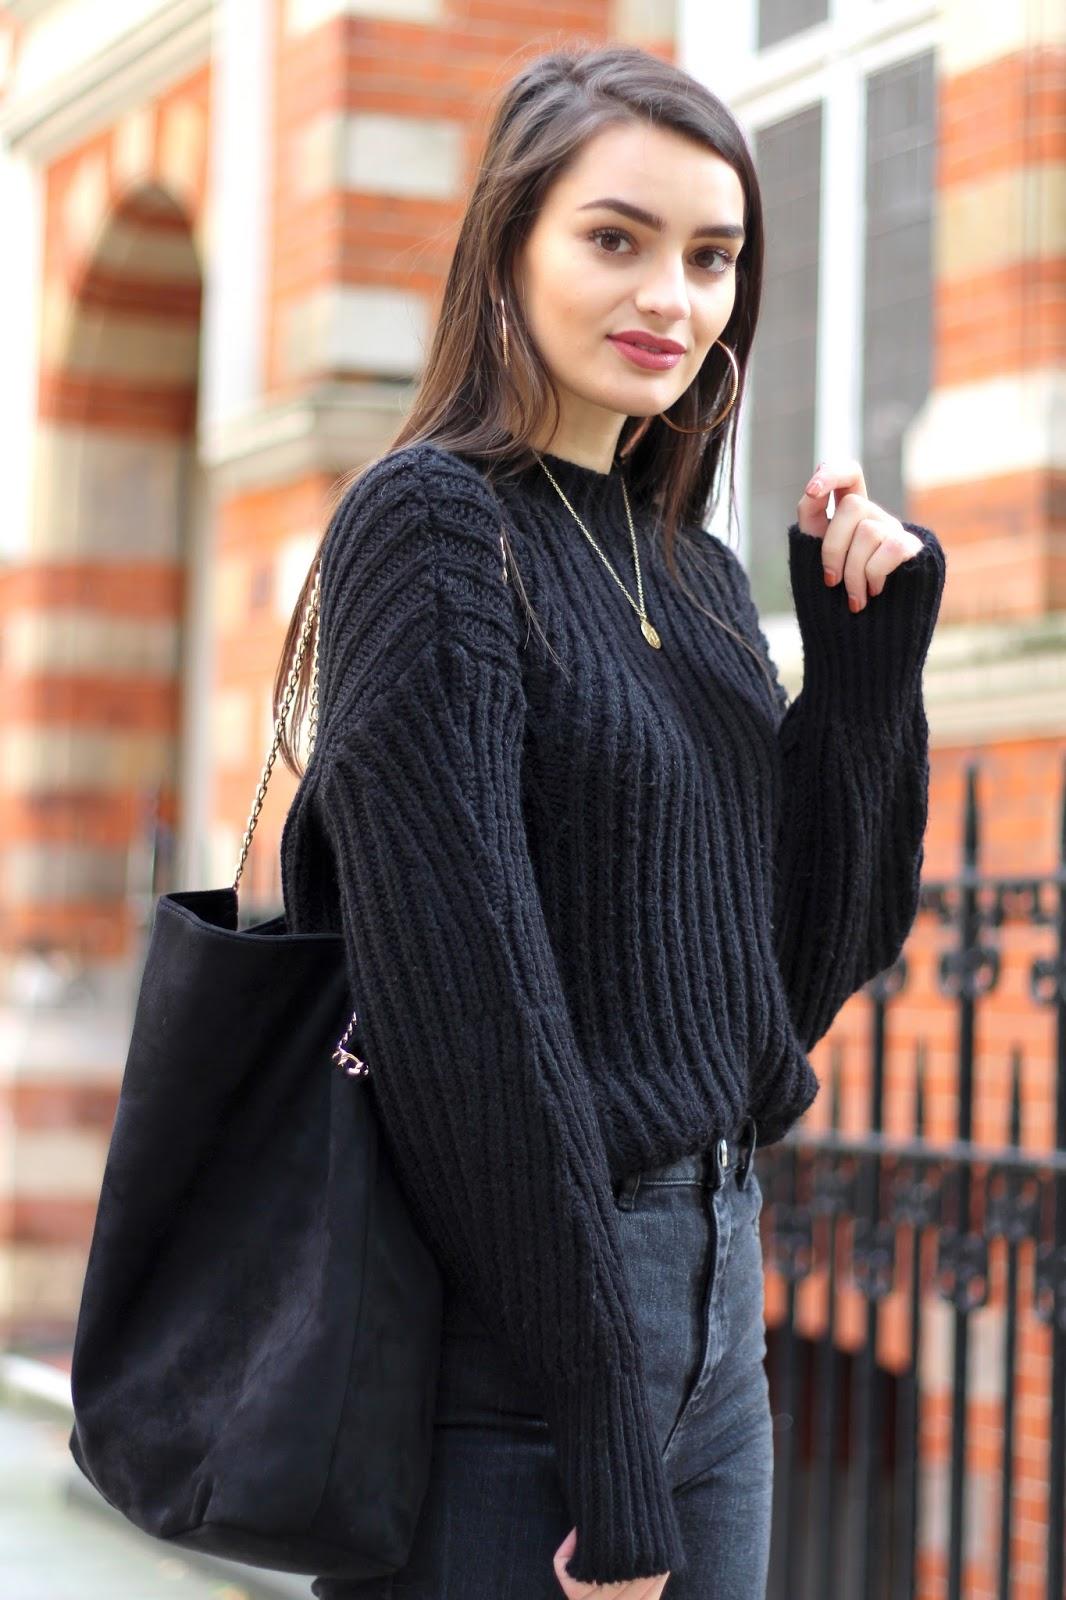 peexo fashion blogger personal style